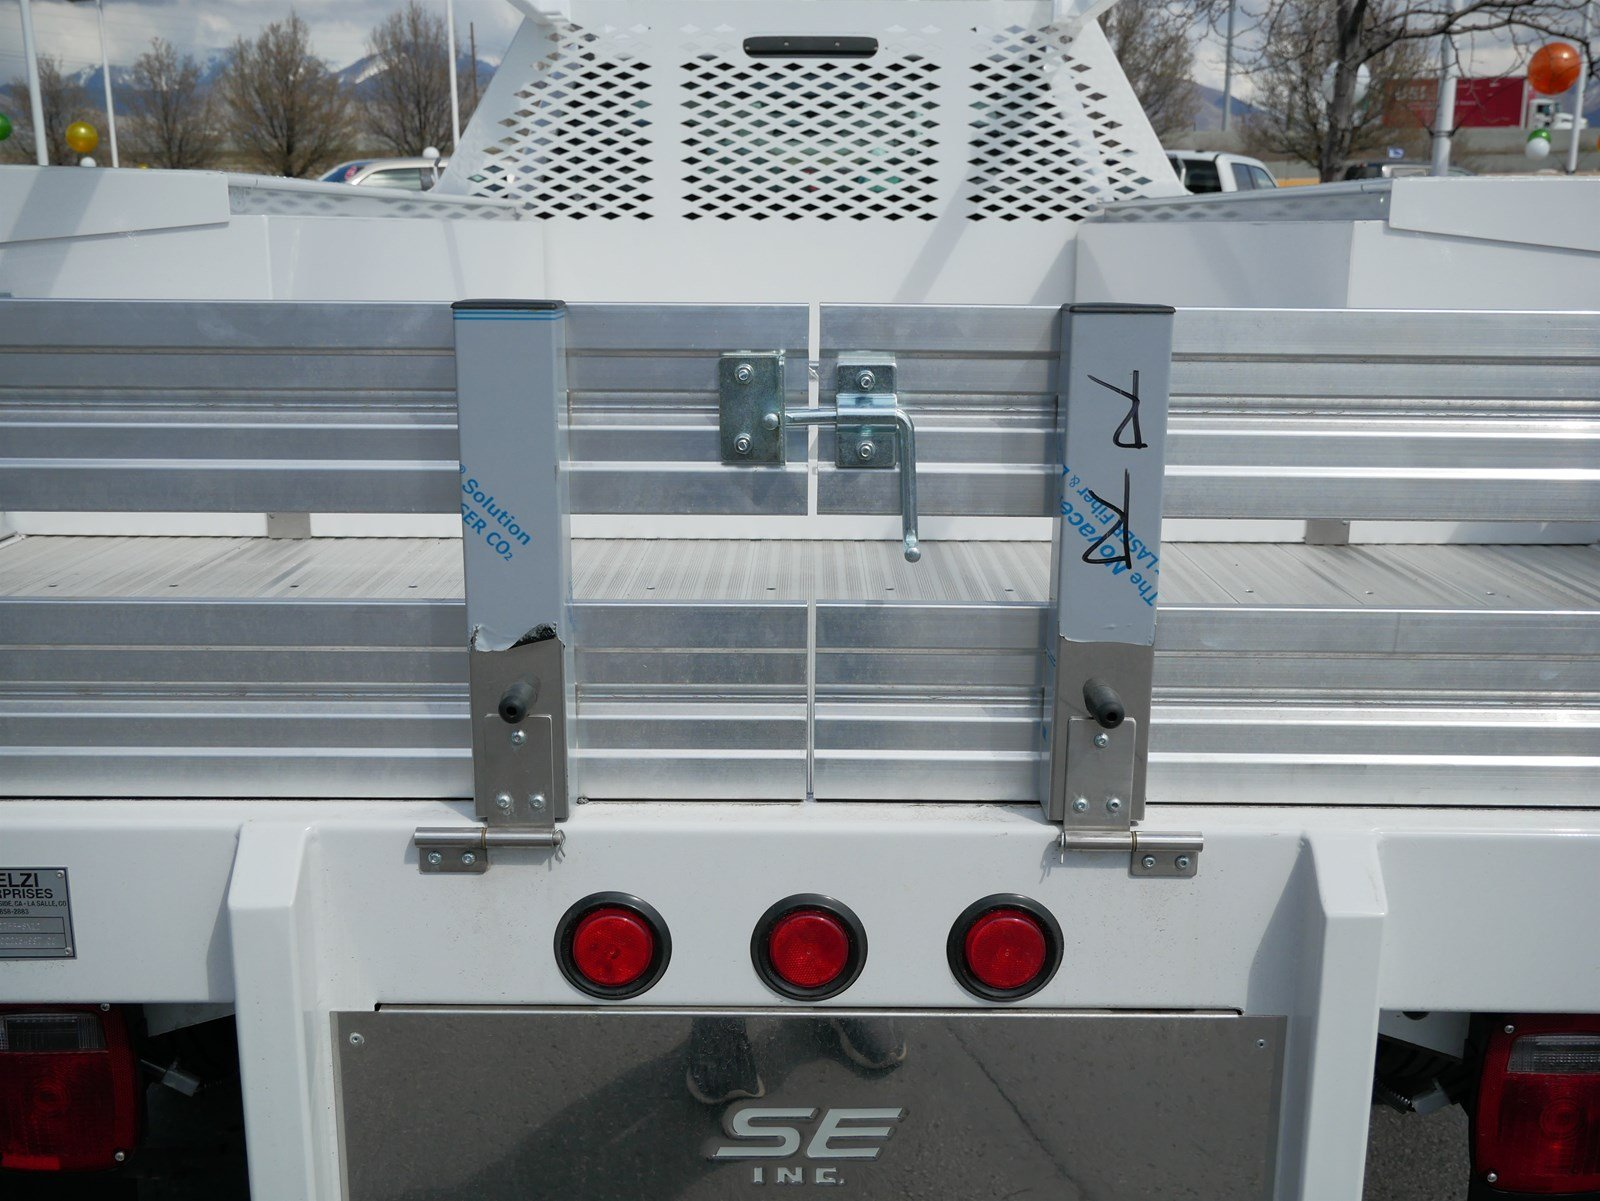 2020 F-550 Regular Cab DRW 4x4, Scelzi CTFB Contractor Body #63072 - photo 26